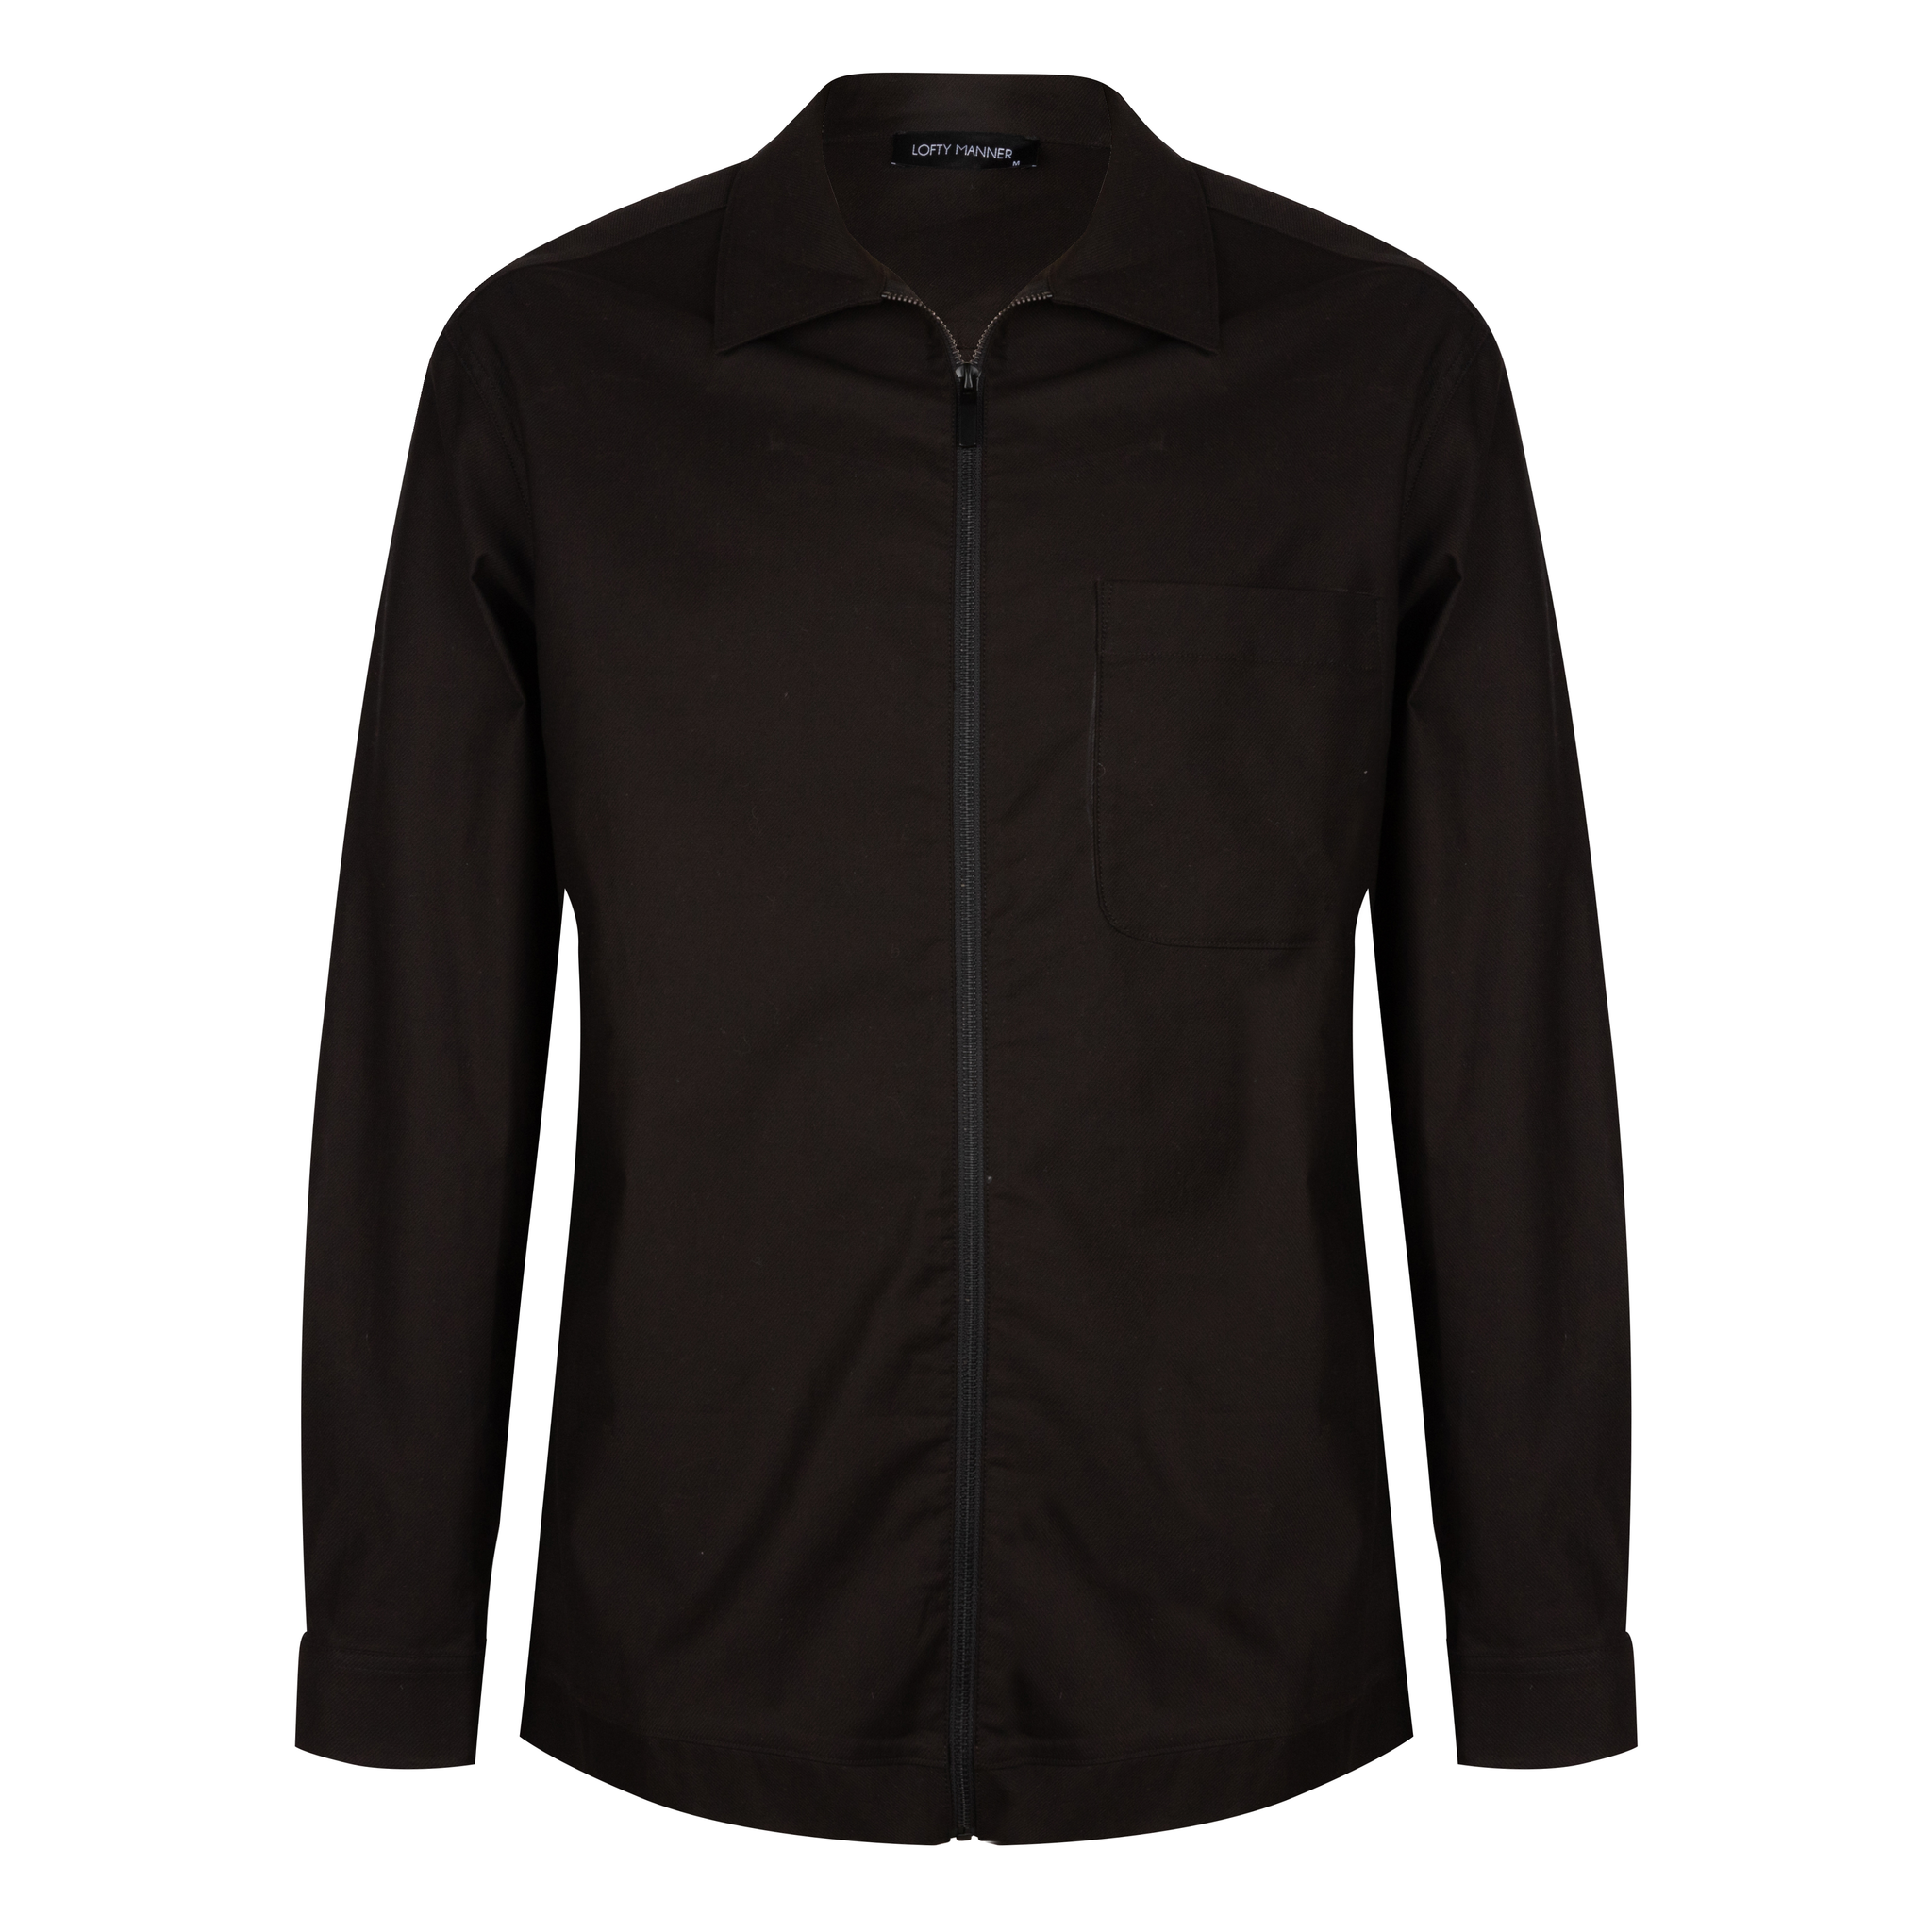 Lofty Manner Black Jacket Roano